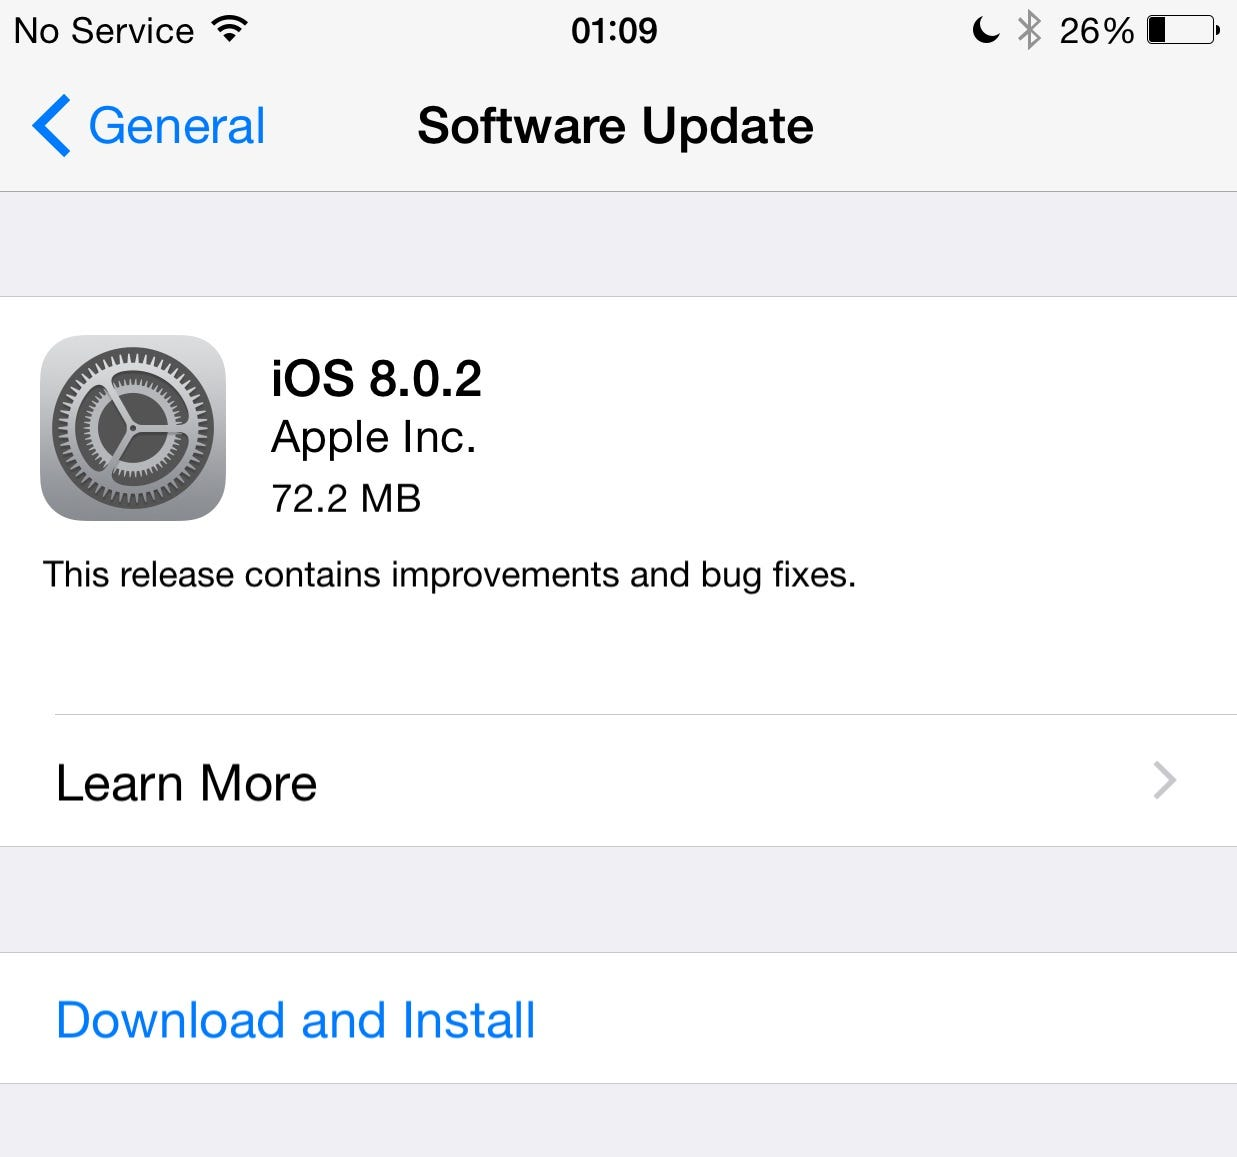 iOS 8.0.2 release